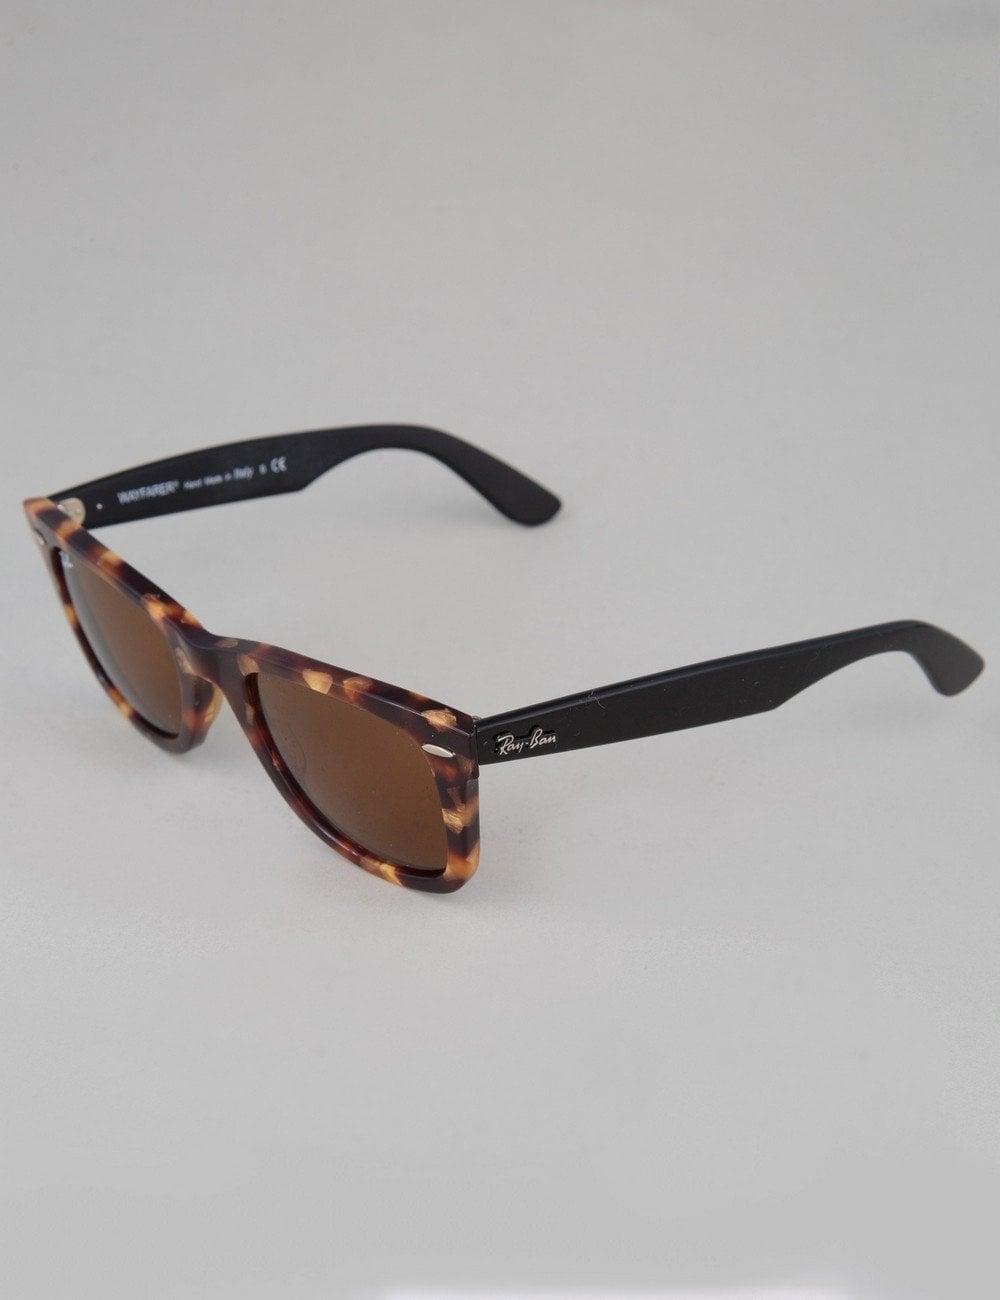 777c86d4008baf Ray-Ban Original Wayfarer Sunglasses - Spotted Brown Havana    Brown ...